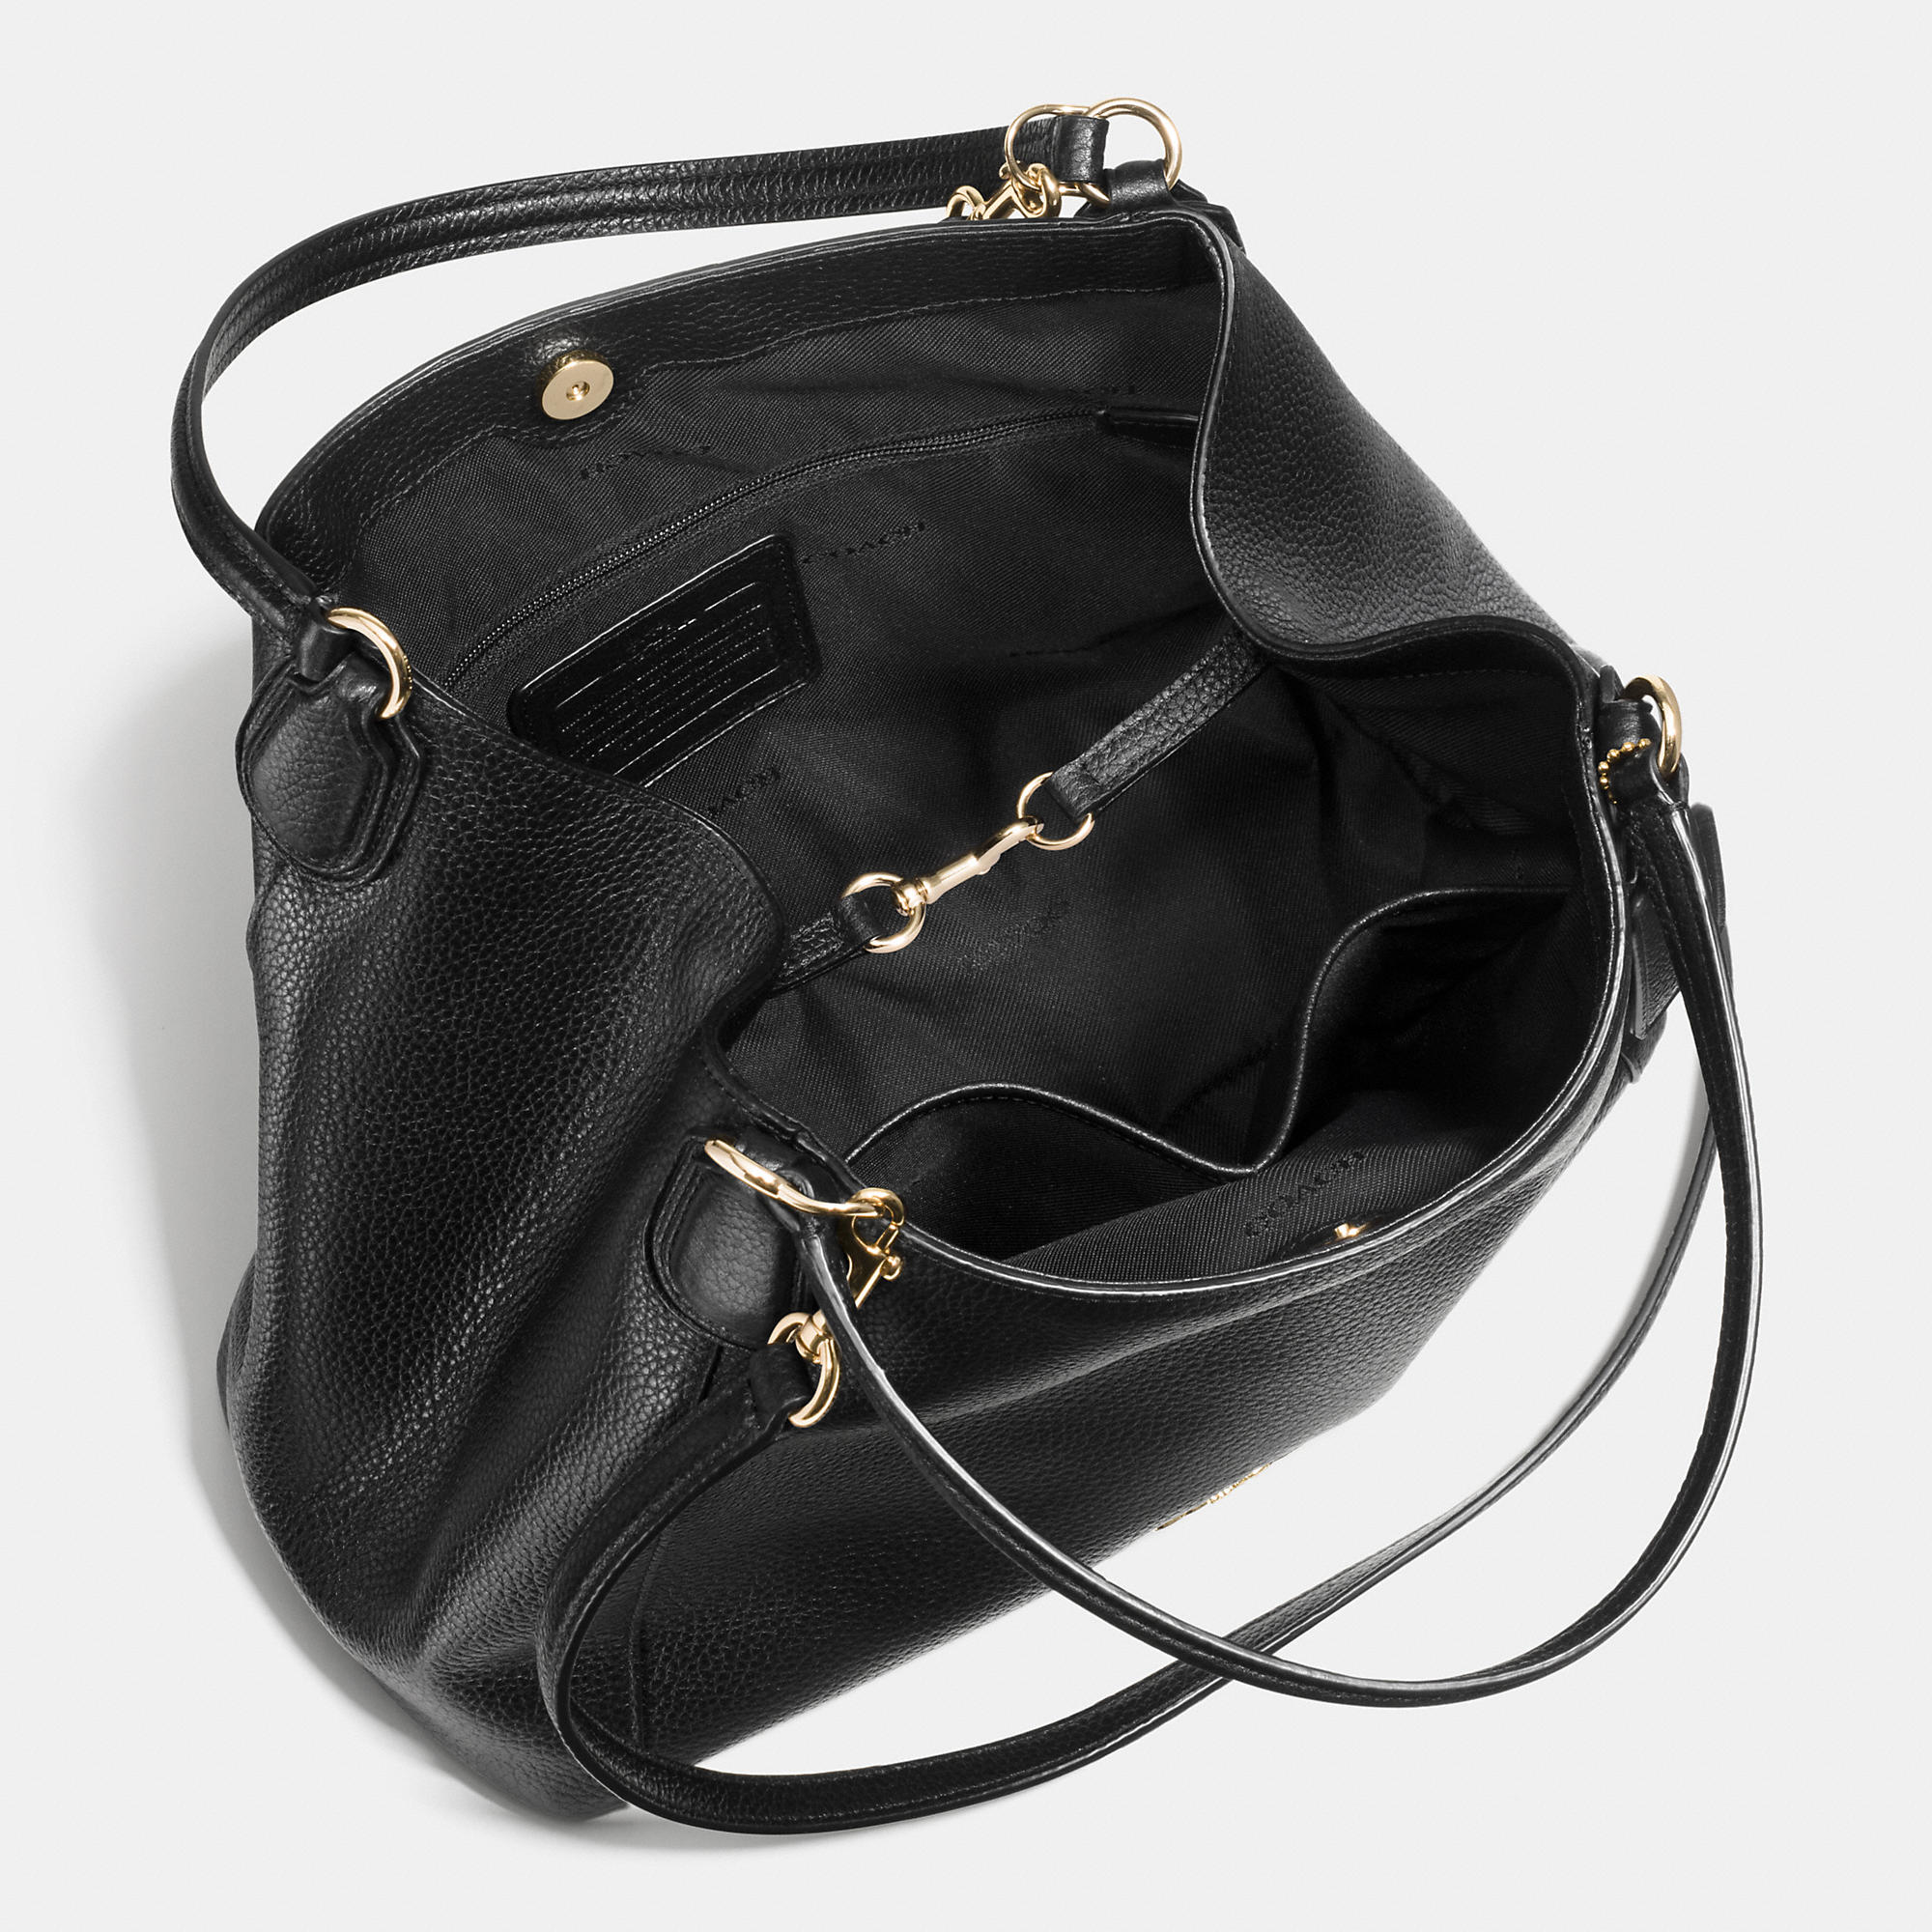 feb8fb3bc6b5 Lyst - COACH Edie Shoulder Bag 28 In Pebble Leather in Black